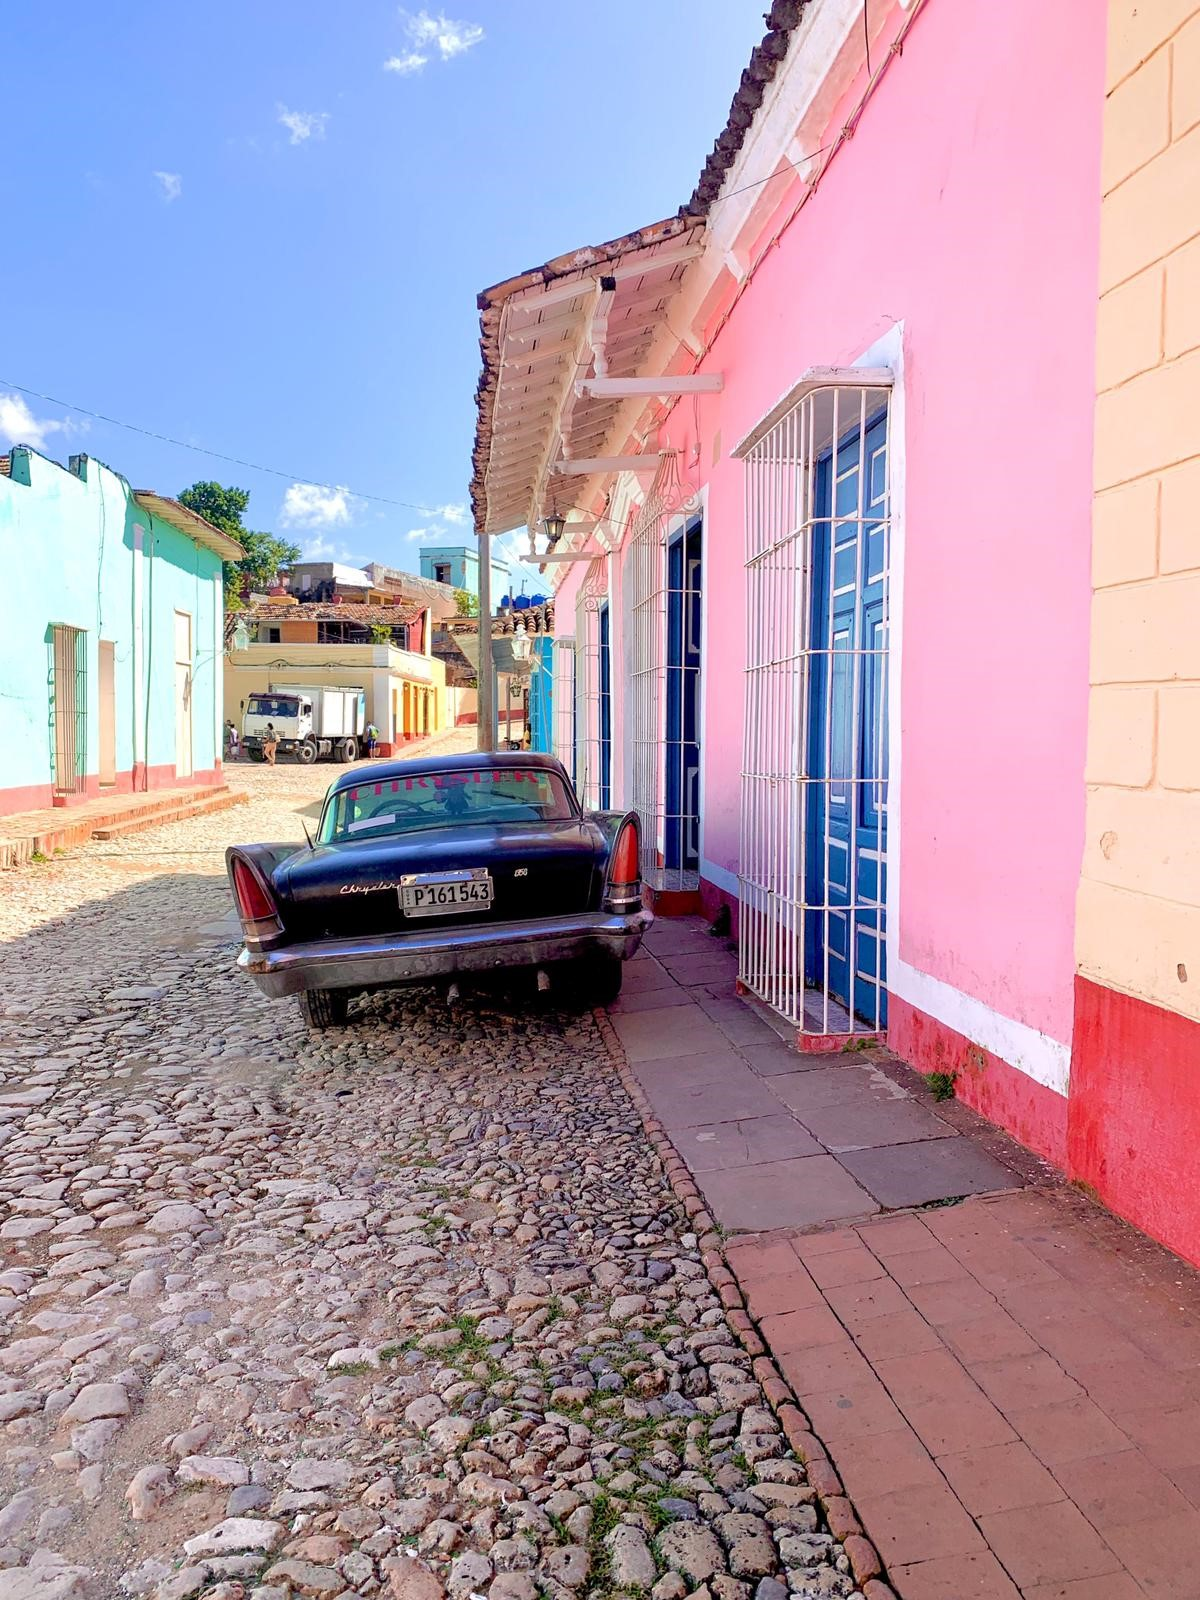 Oldtimer vor rosaner Hausfasade auf Kuba